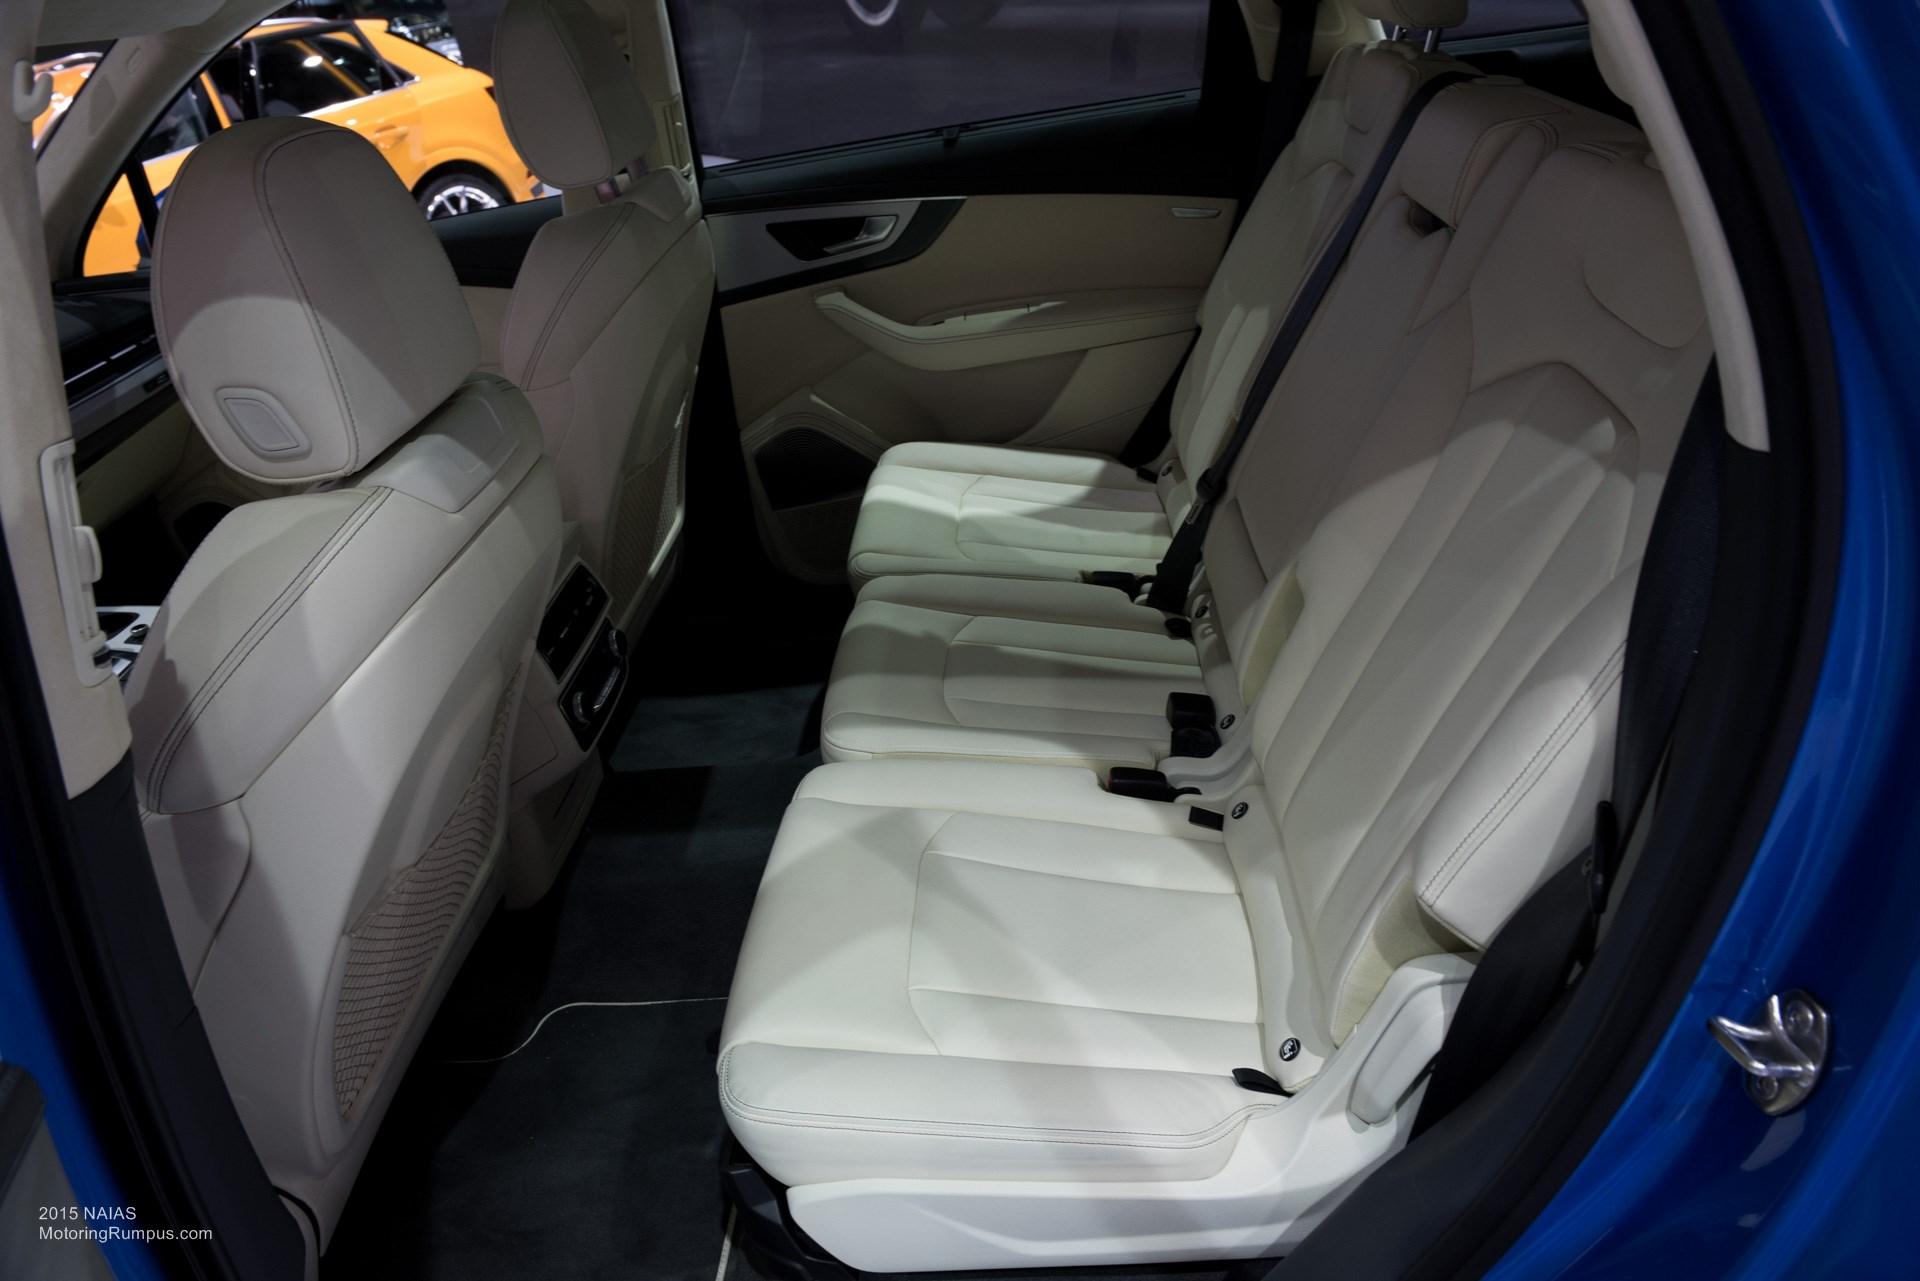 2015 NAIAS Audi Q7 Rear Seats